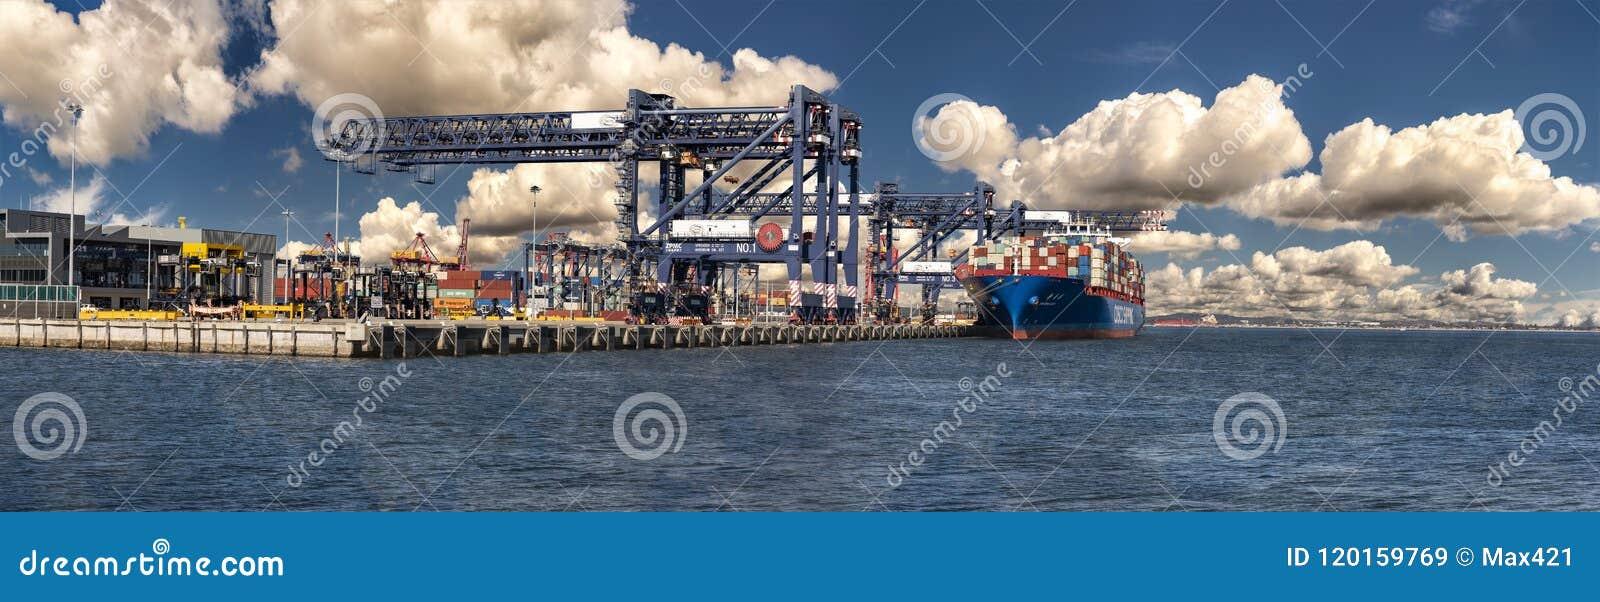 Haynes Dock Container Cargo Wharf, Port Botany Editorial